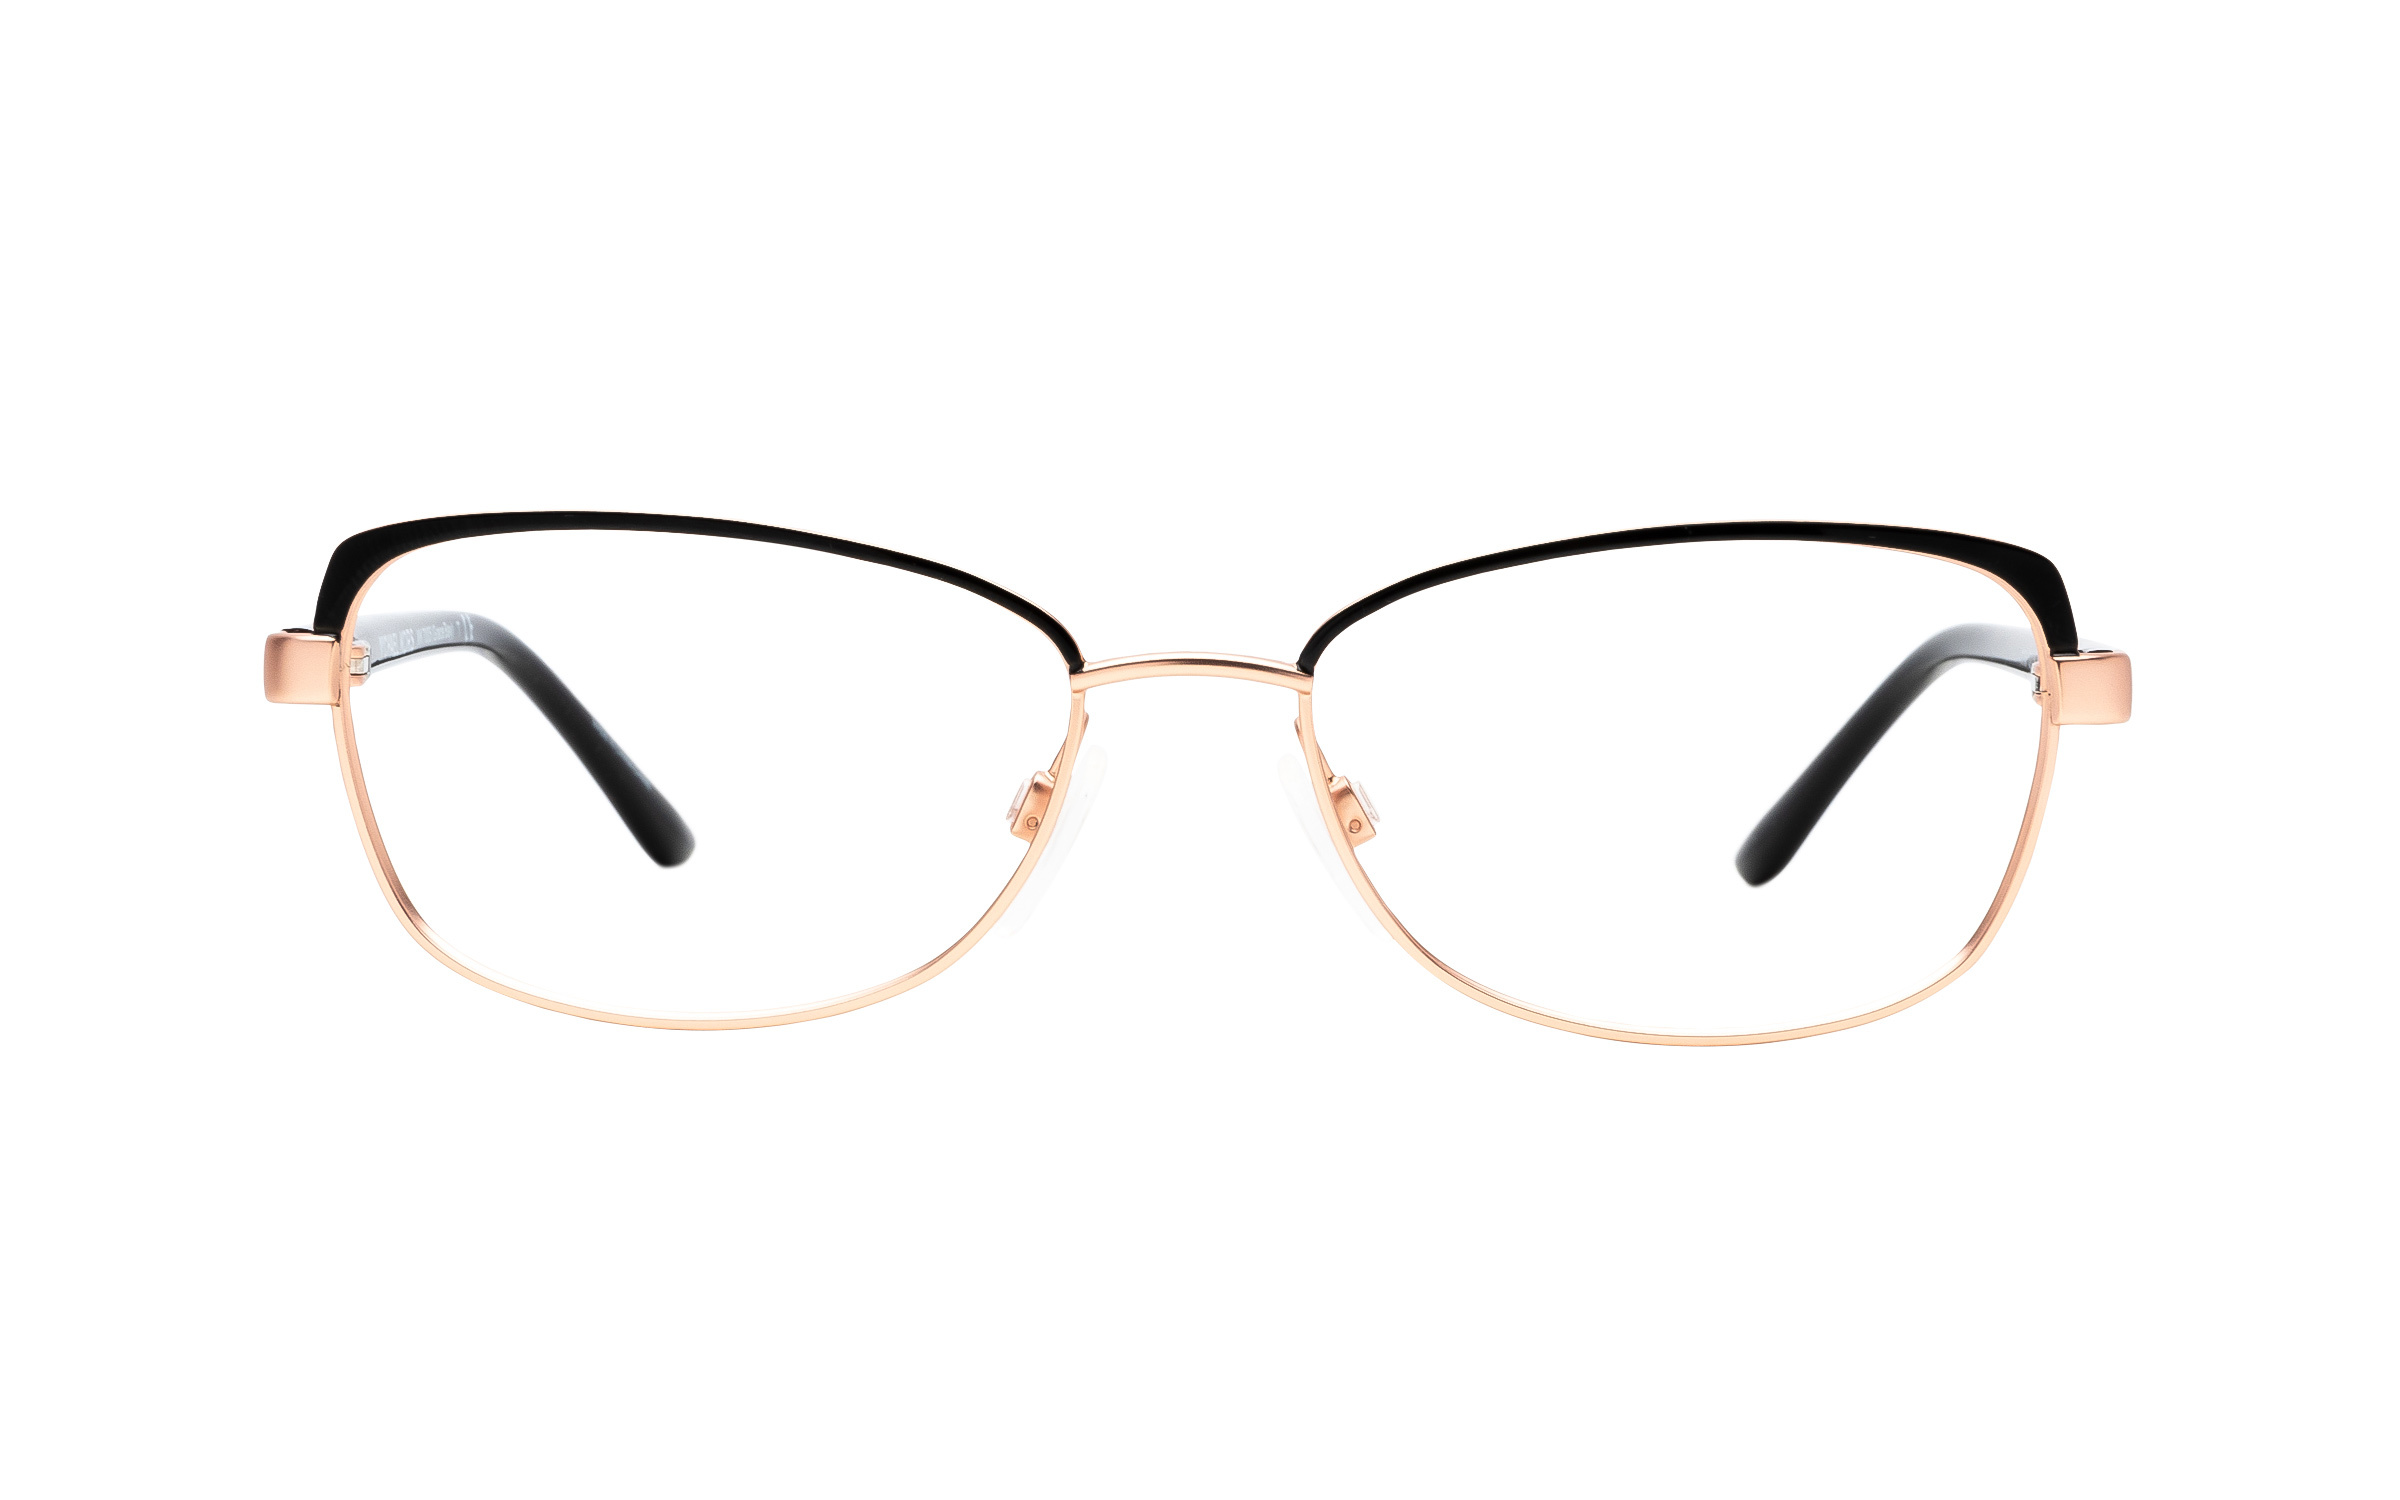 Michael Kors Grace Bay MK7005 1113 (52) Eyeglasses and Frame in Satin Rose Black/Gold | Acetate/Metal - Online